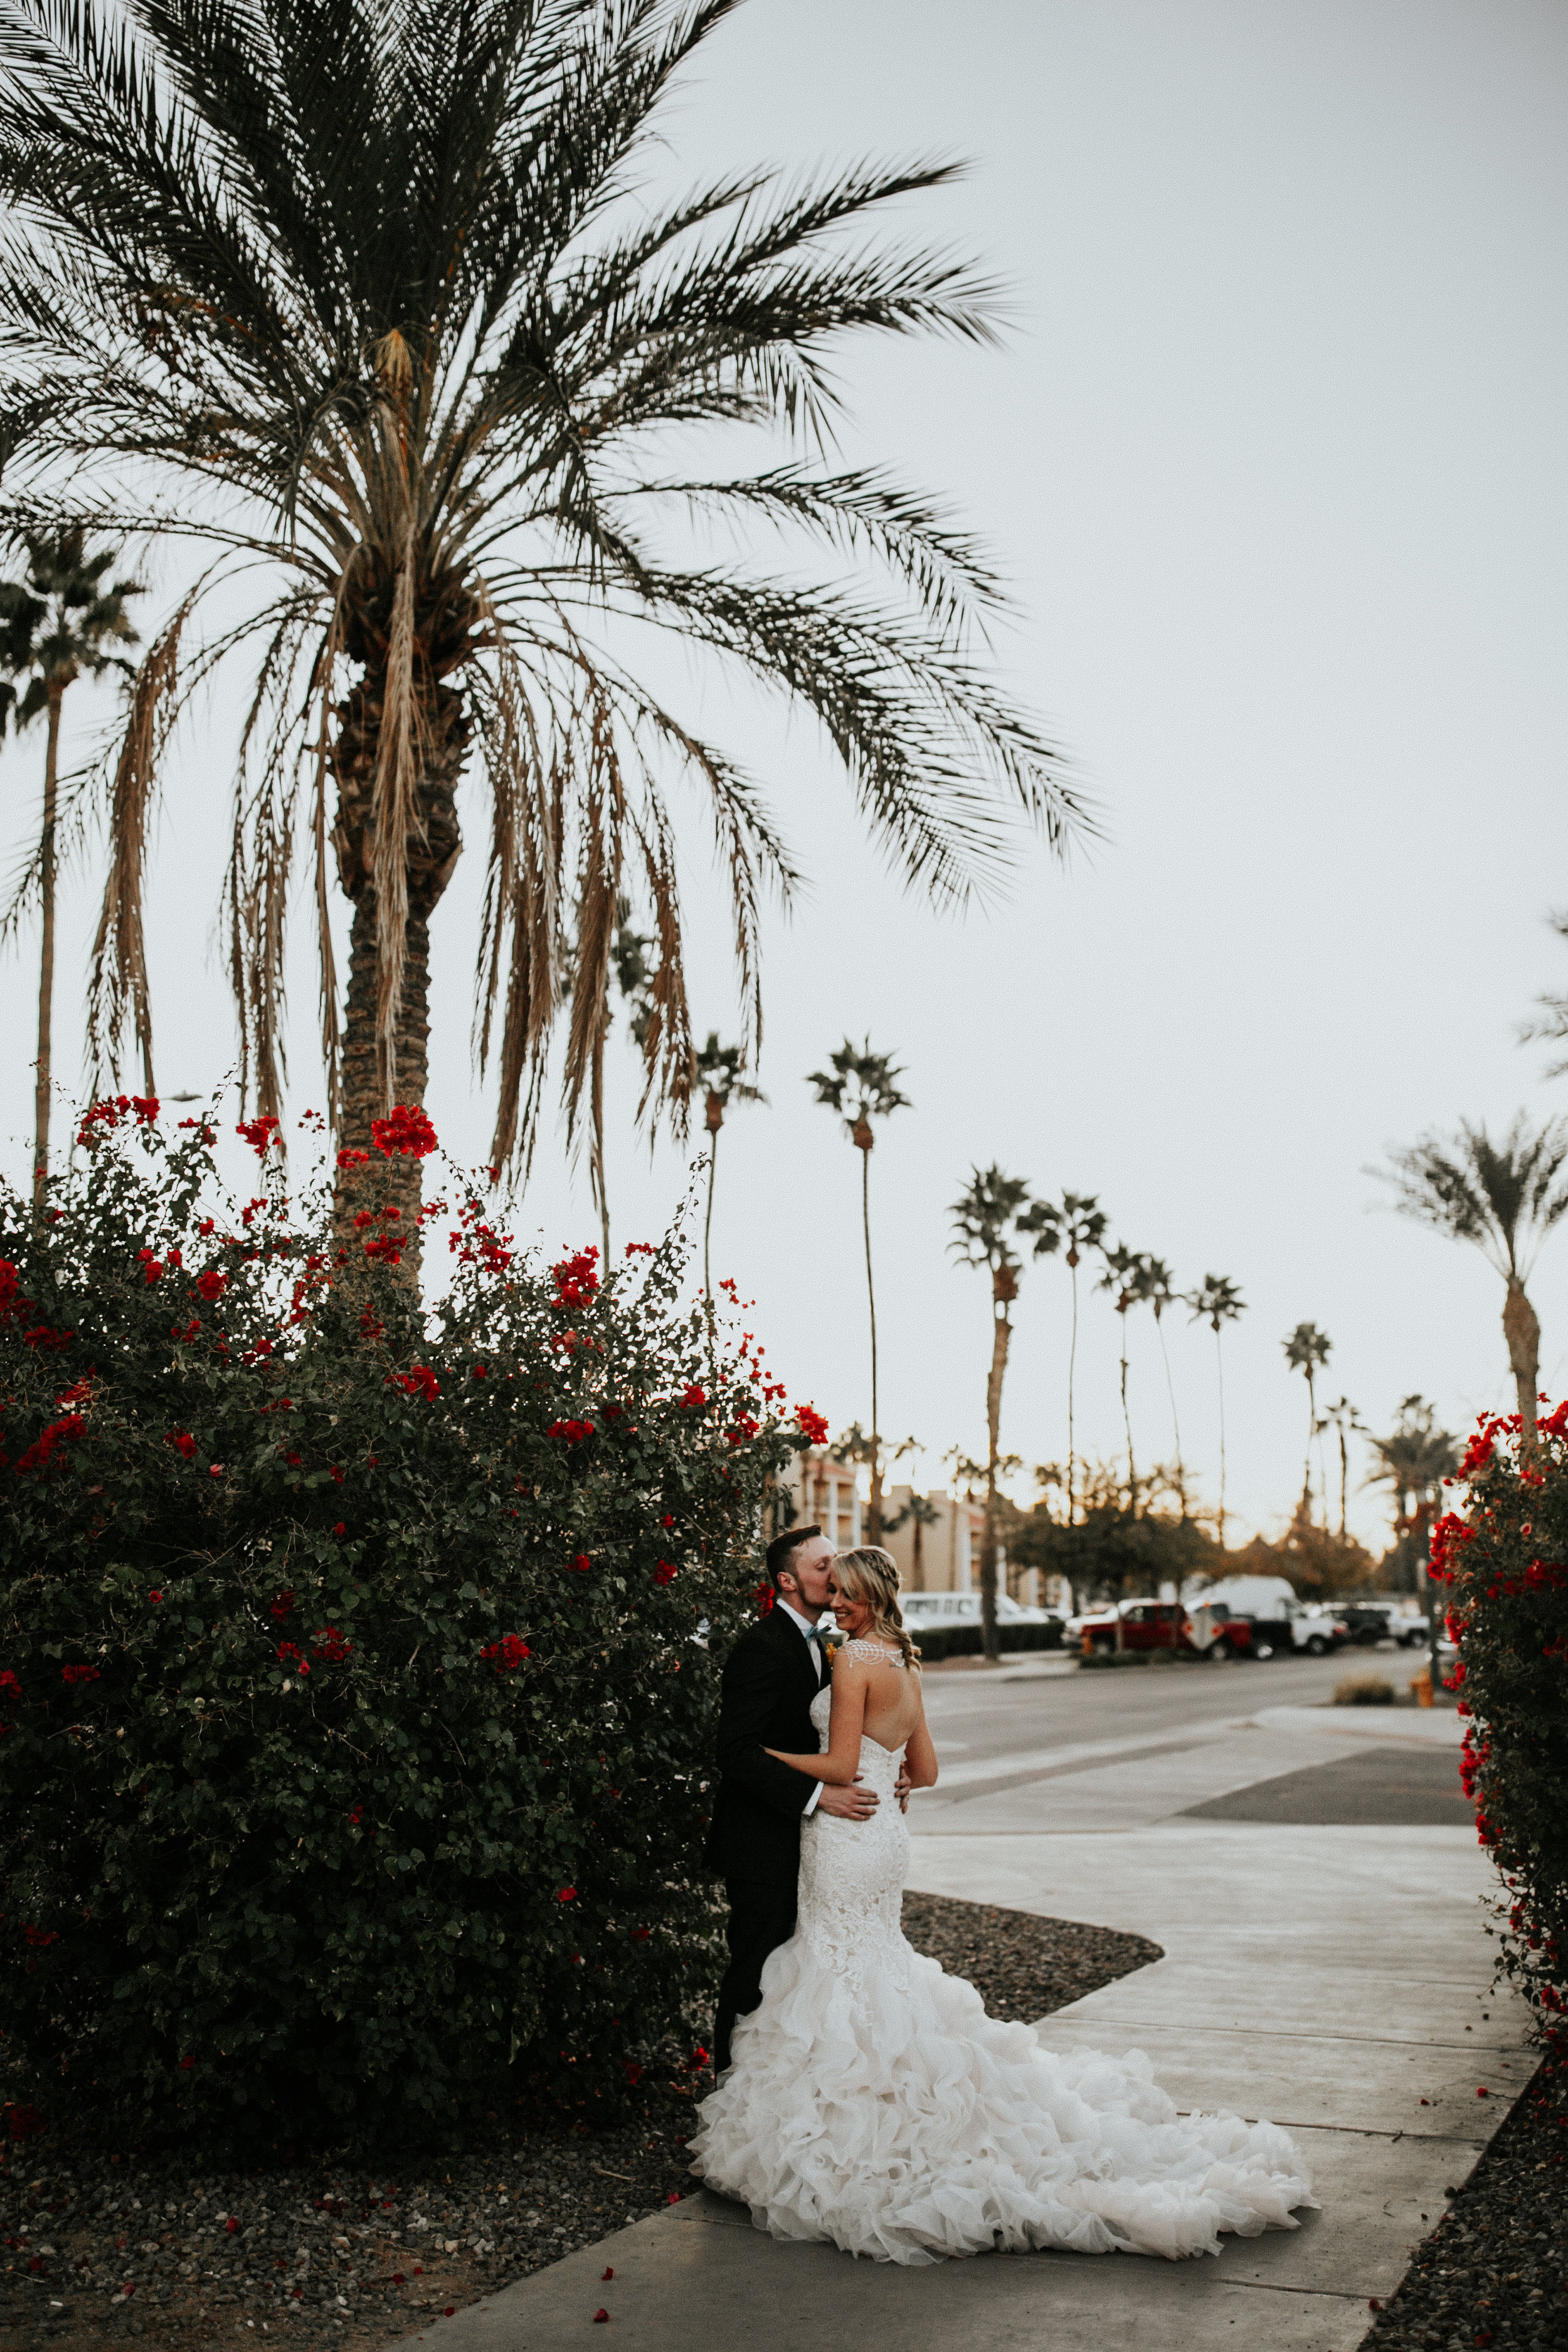 adventure-wedding-photographer-gracetphotography-49.jpg